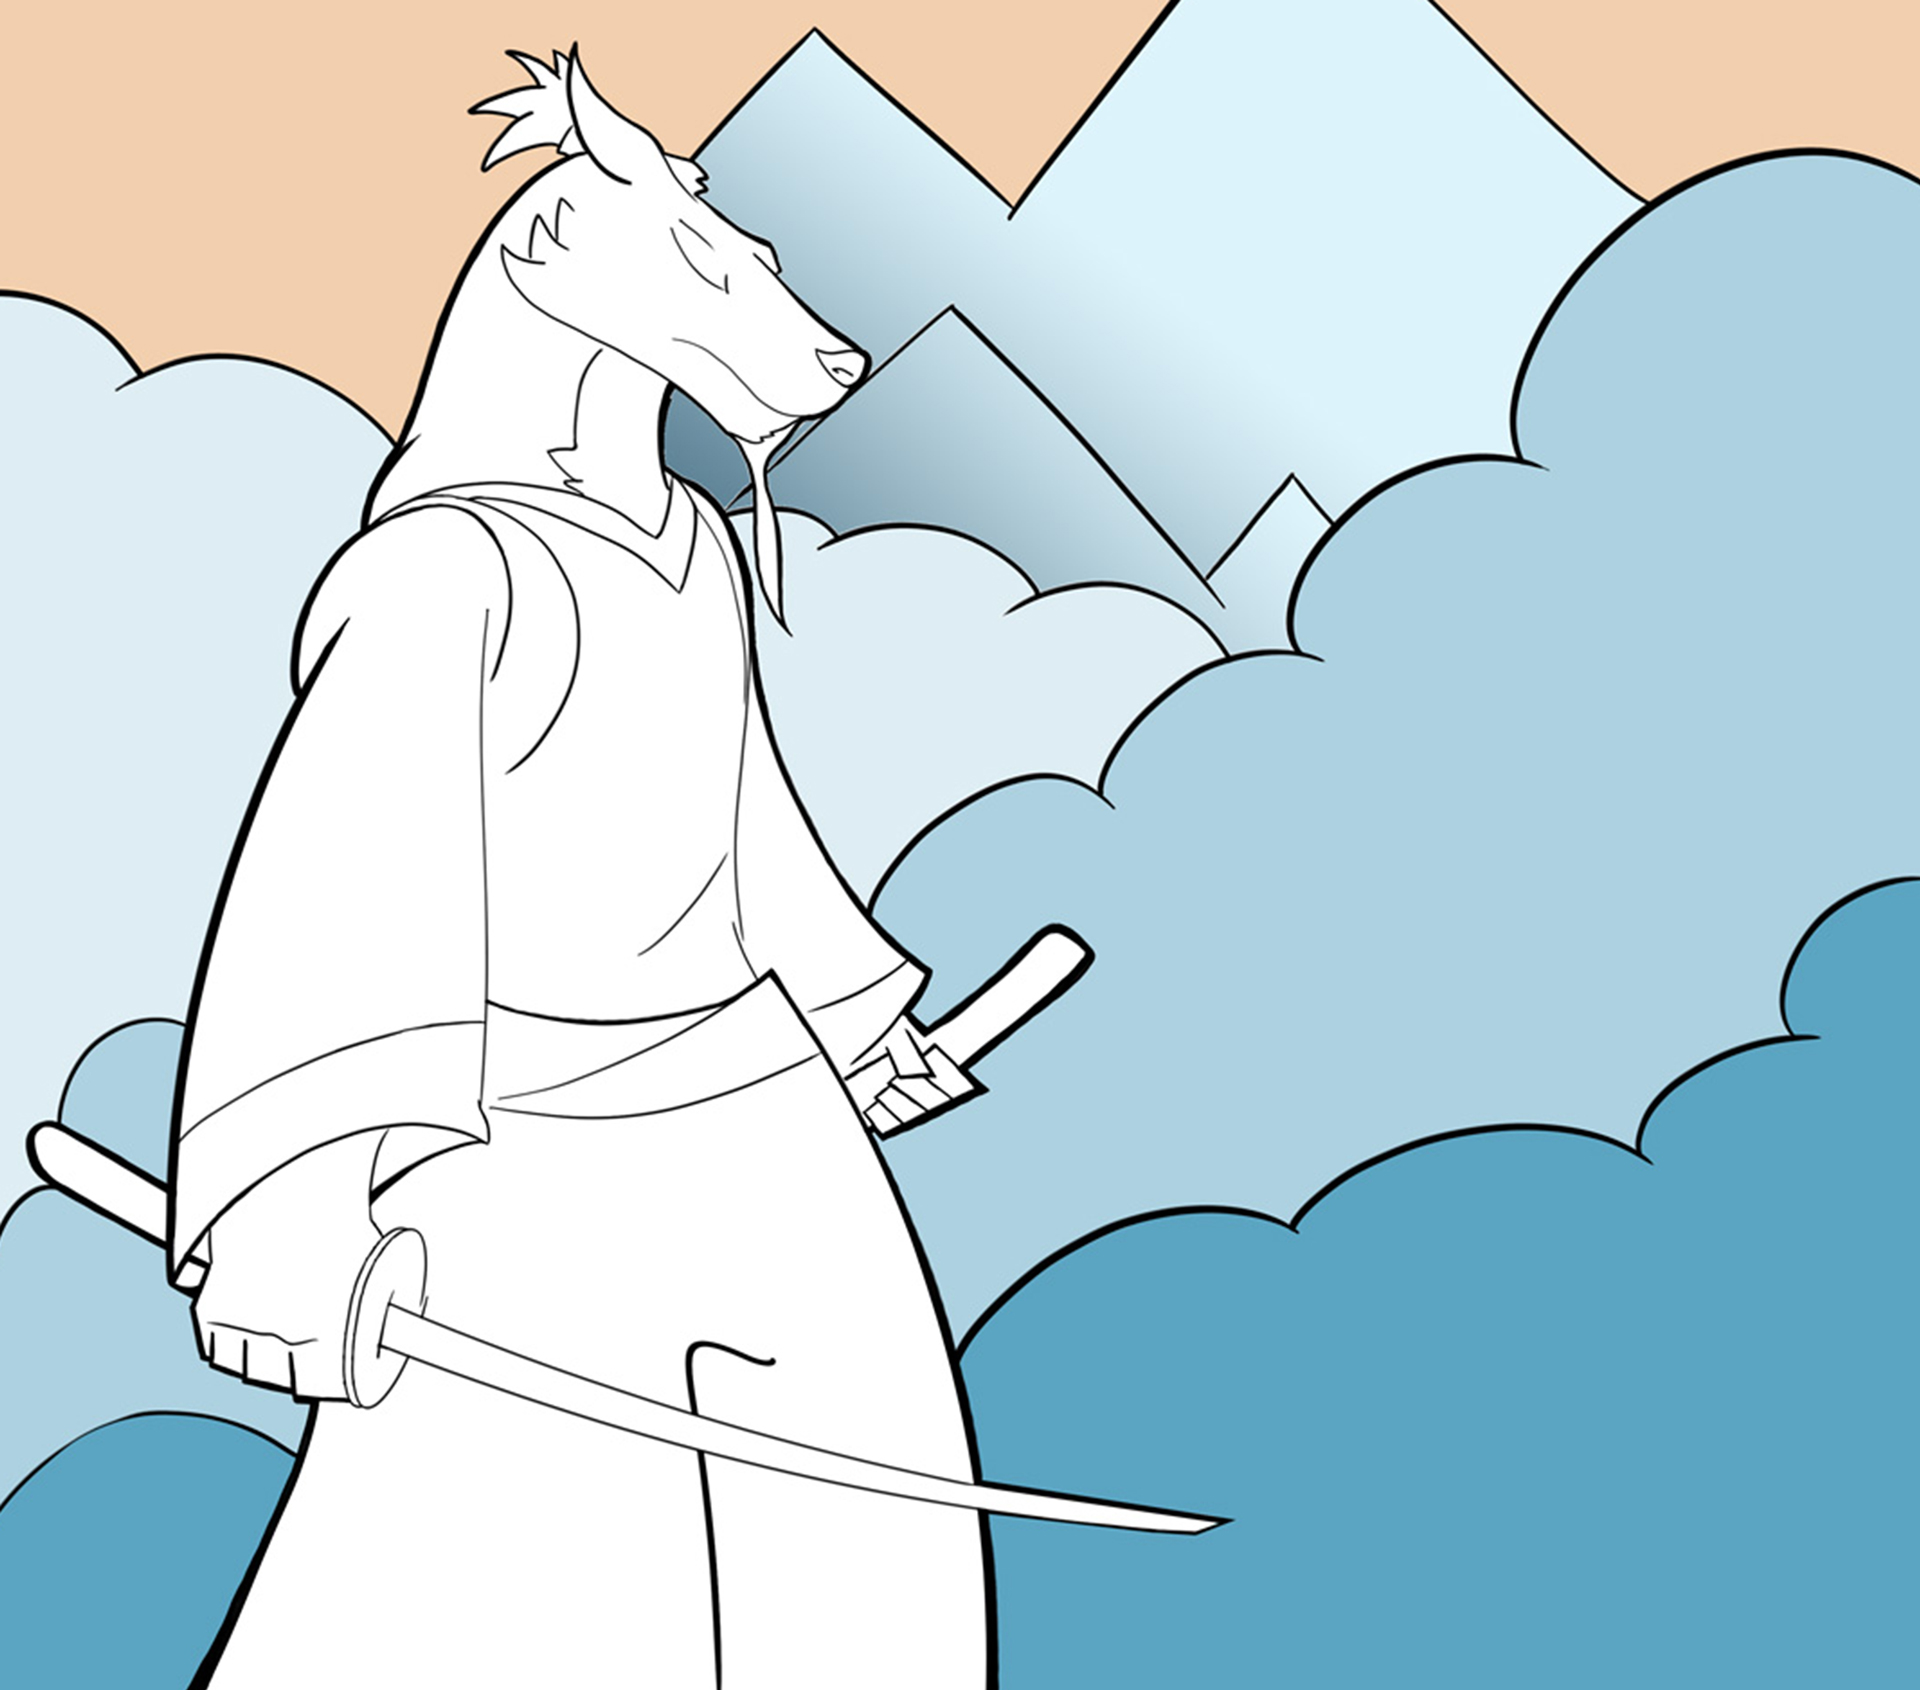 samurai-wolf-illustration-06.jpg